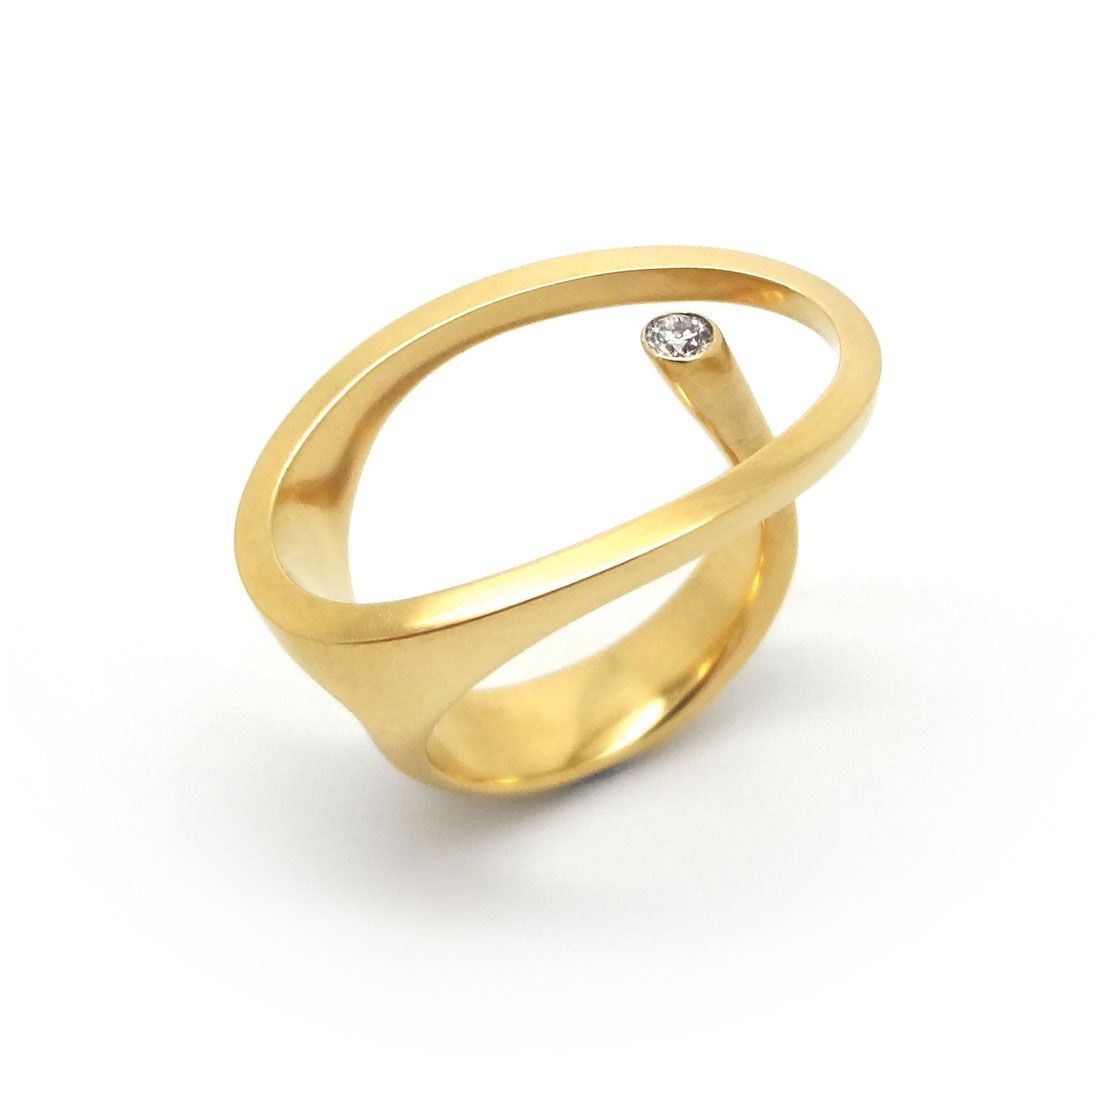 Amazing ORRO Contemporary Jewellery Glasgow Angela Hubel Yellow Gold Klein Stein Ring Modern Gold u Diamond Rings by Angela Hubel at ORRO Jewellery Glasgow